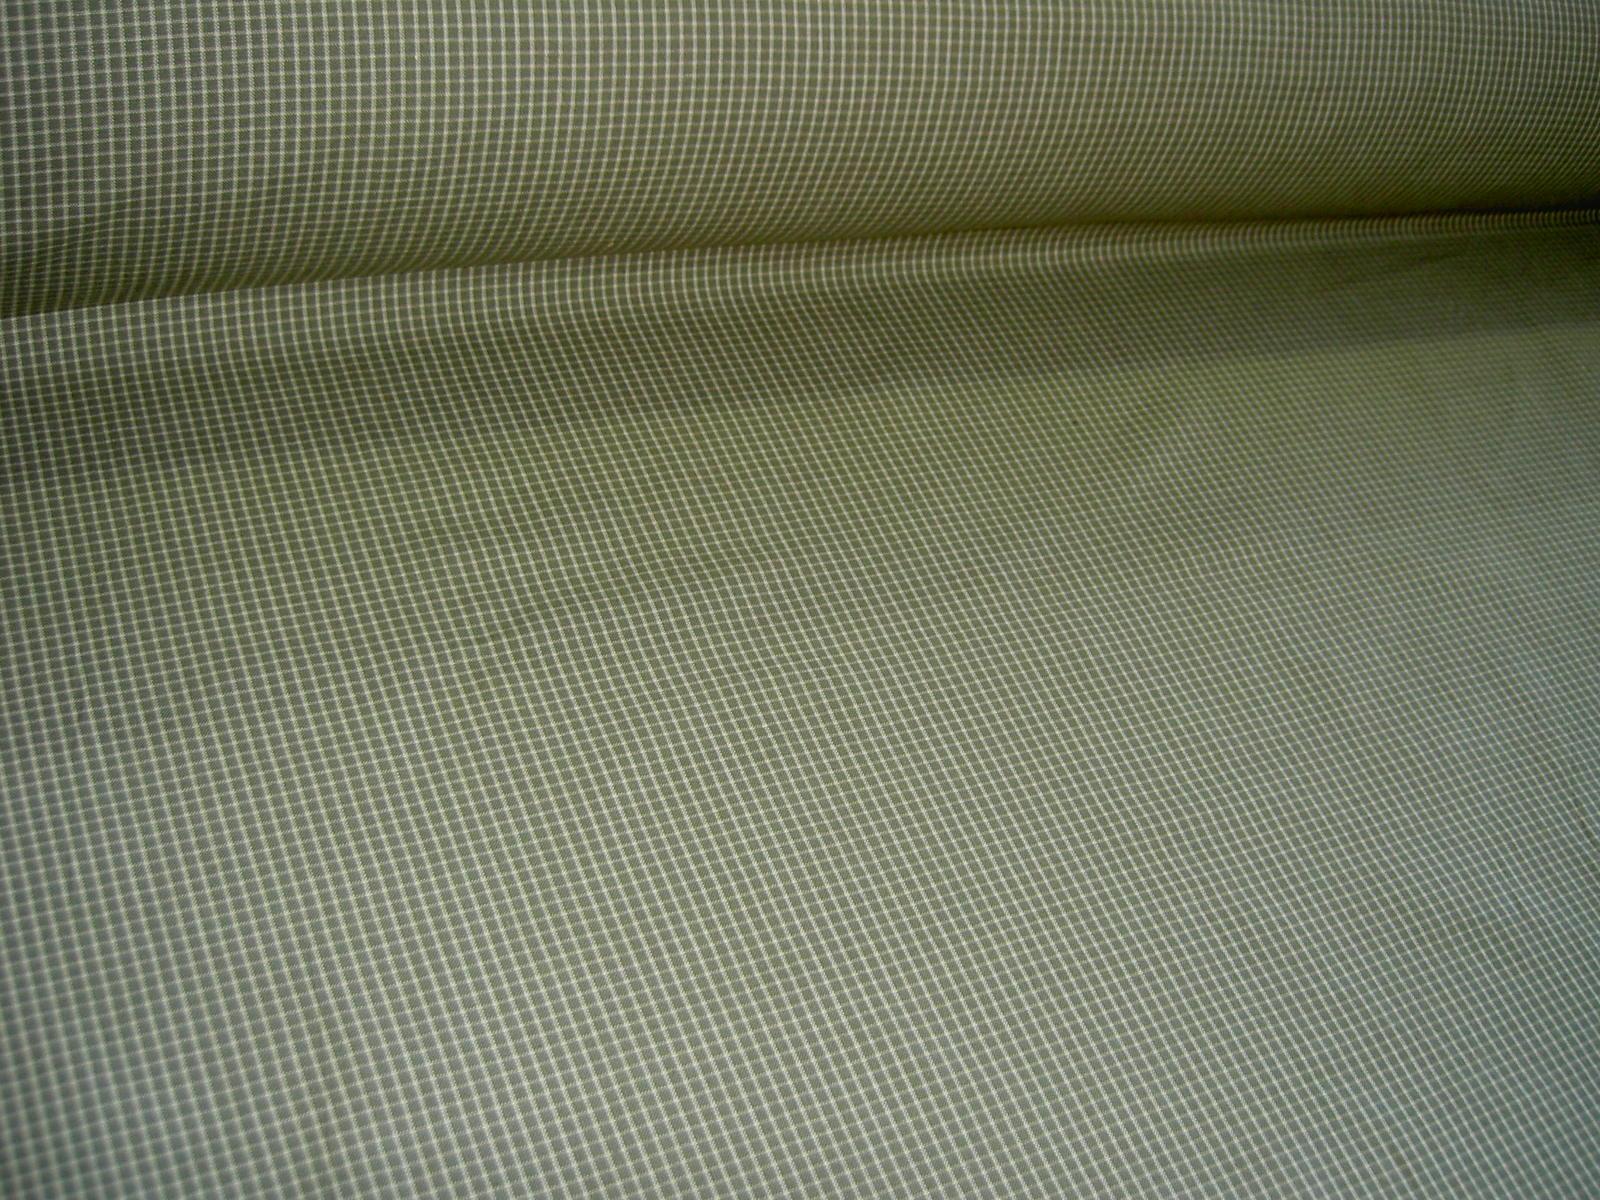 Ralph Lauren Sherwood Check Color Sage Closeout Home Decor Fabric